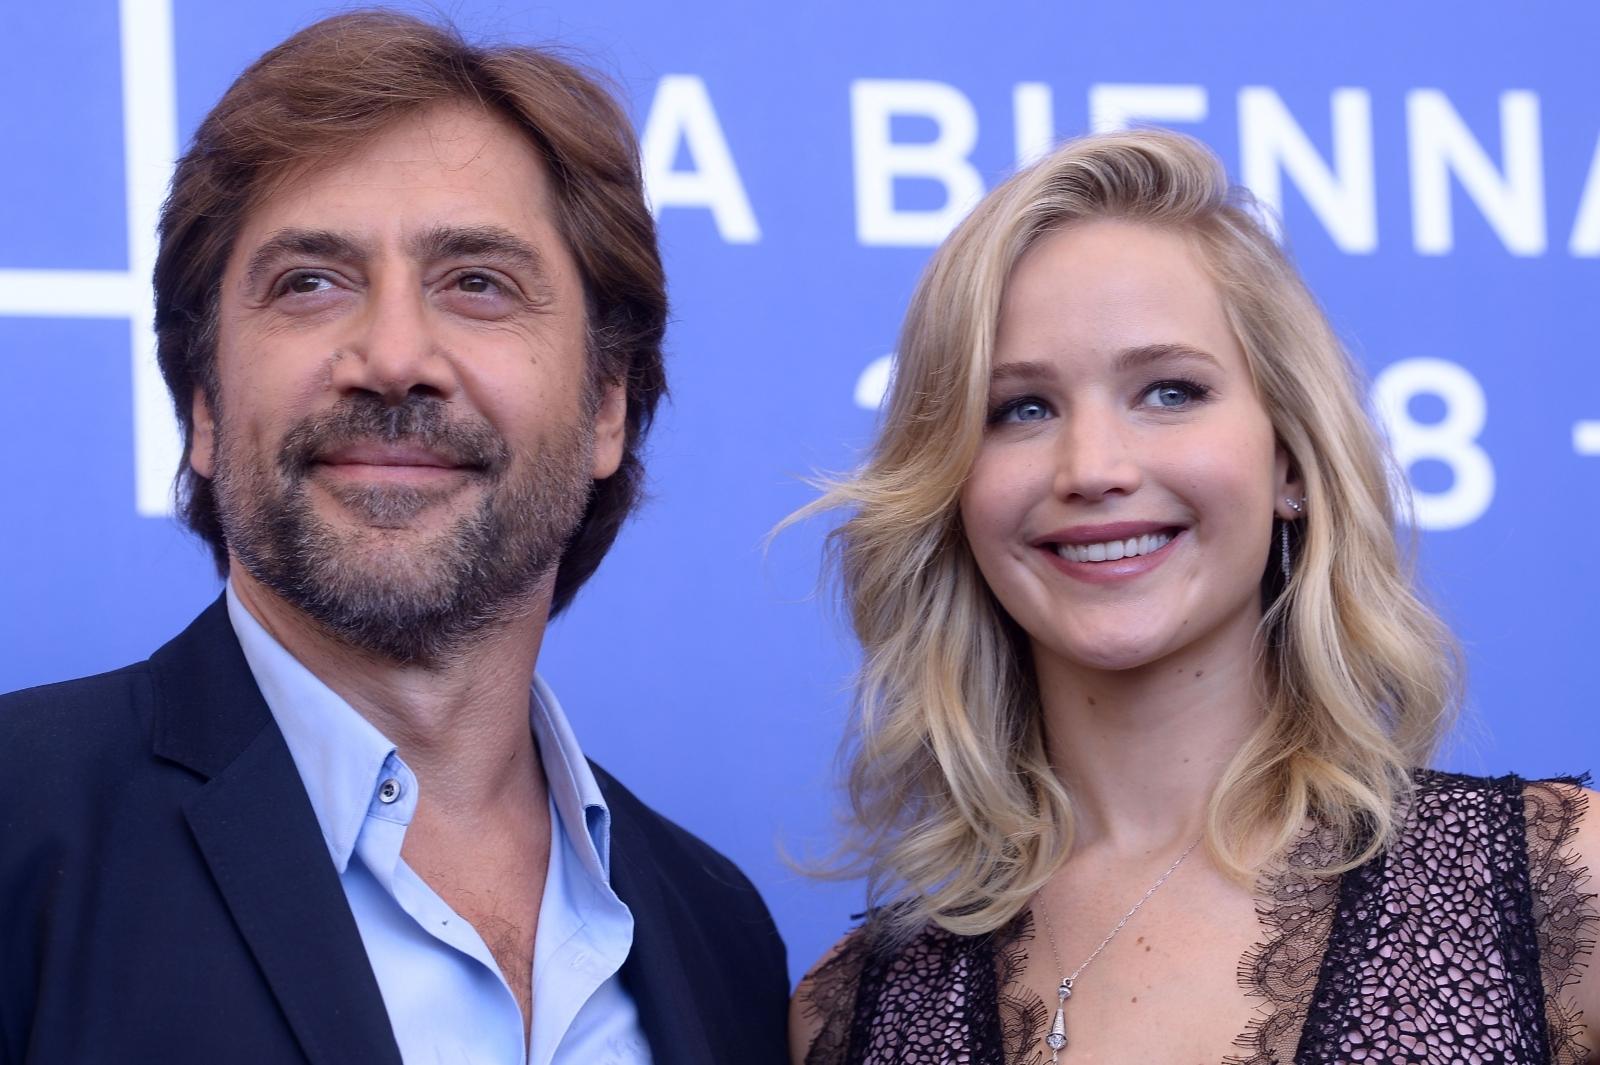 Javier Bardem and Jennifer Lawrence